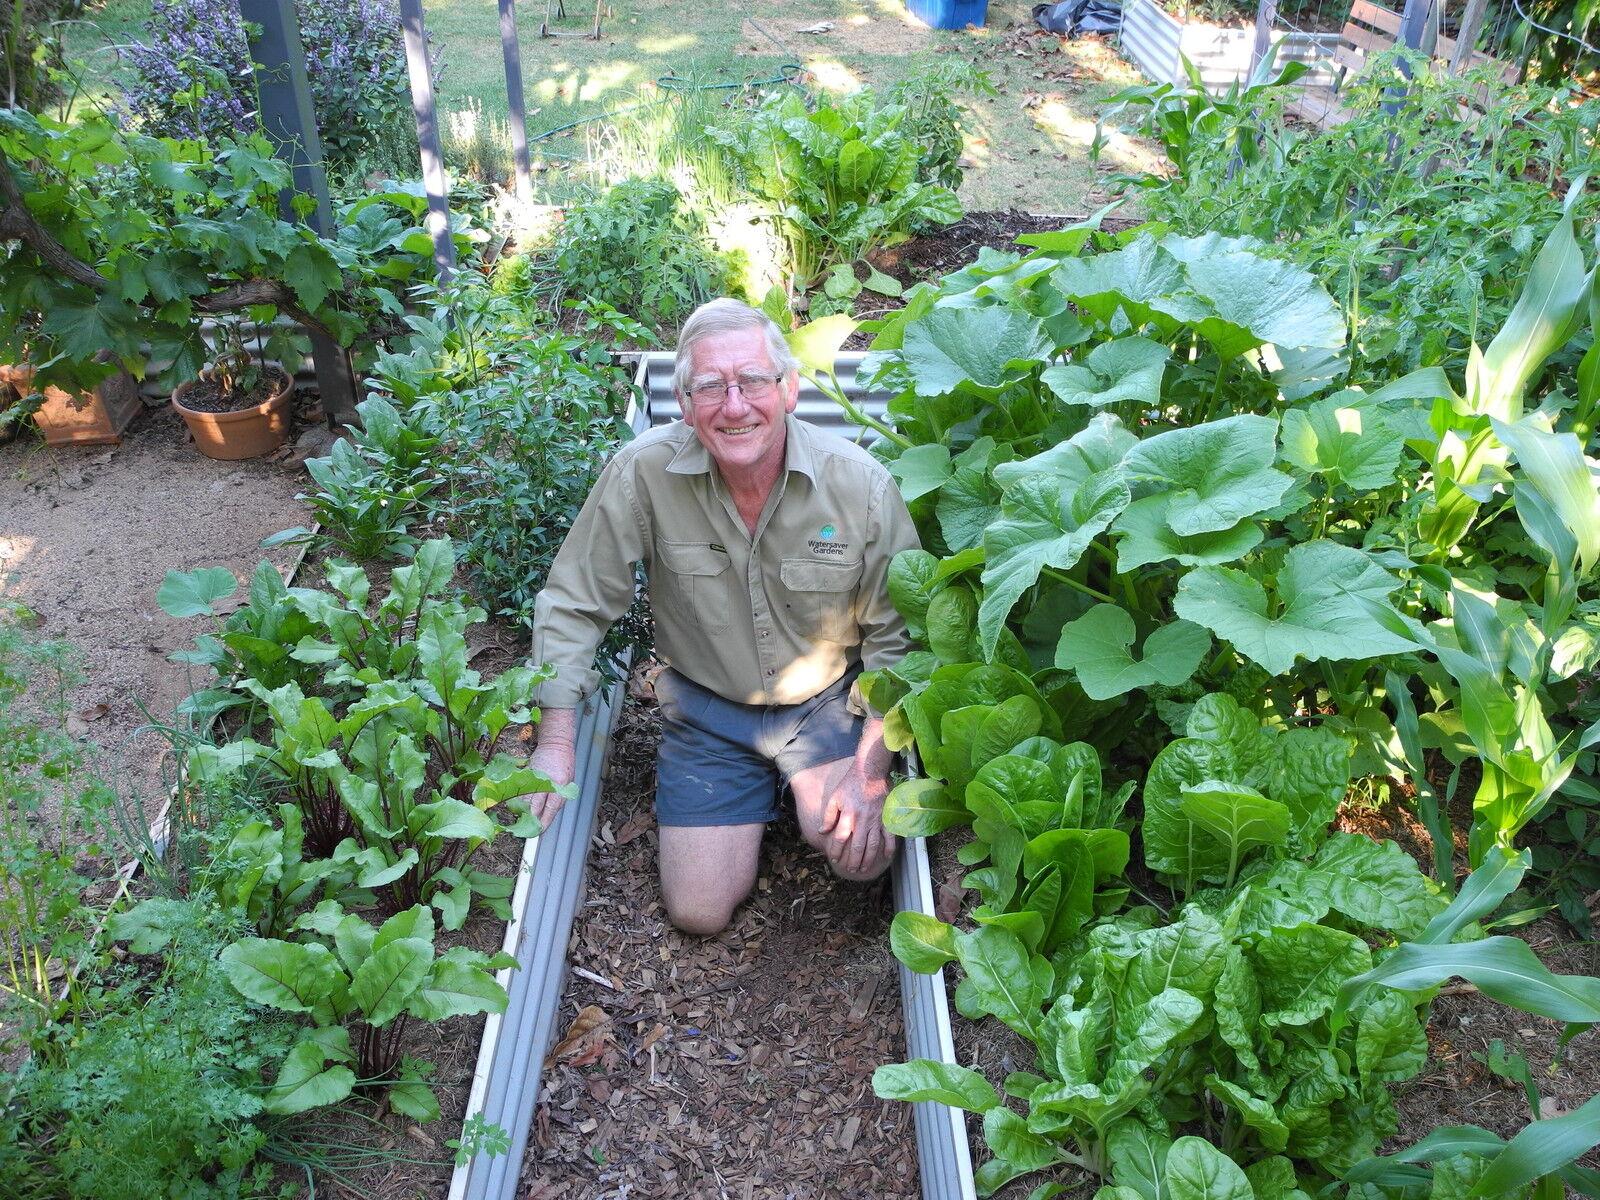 Water saver gardens